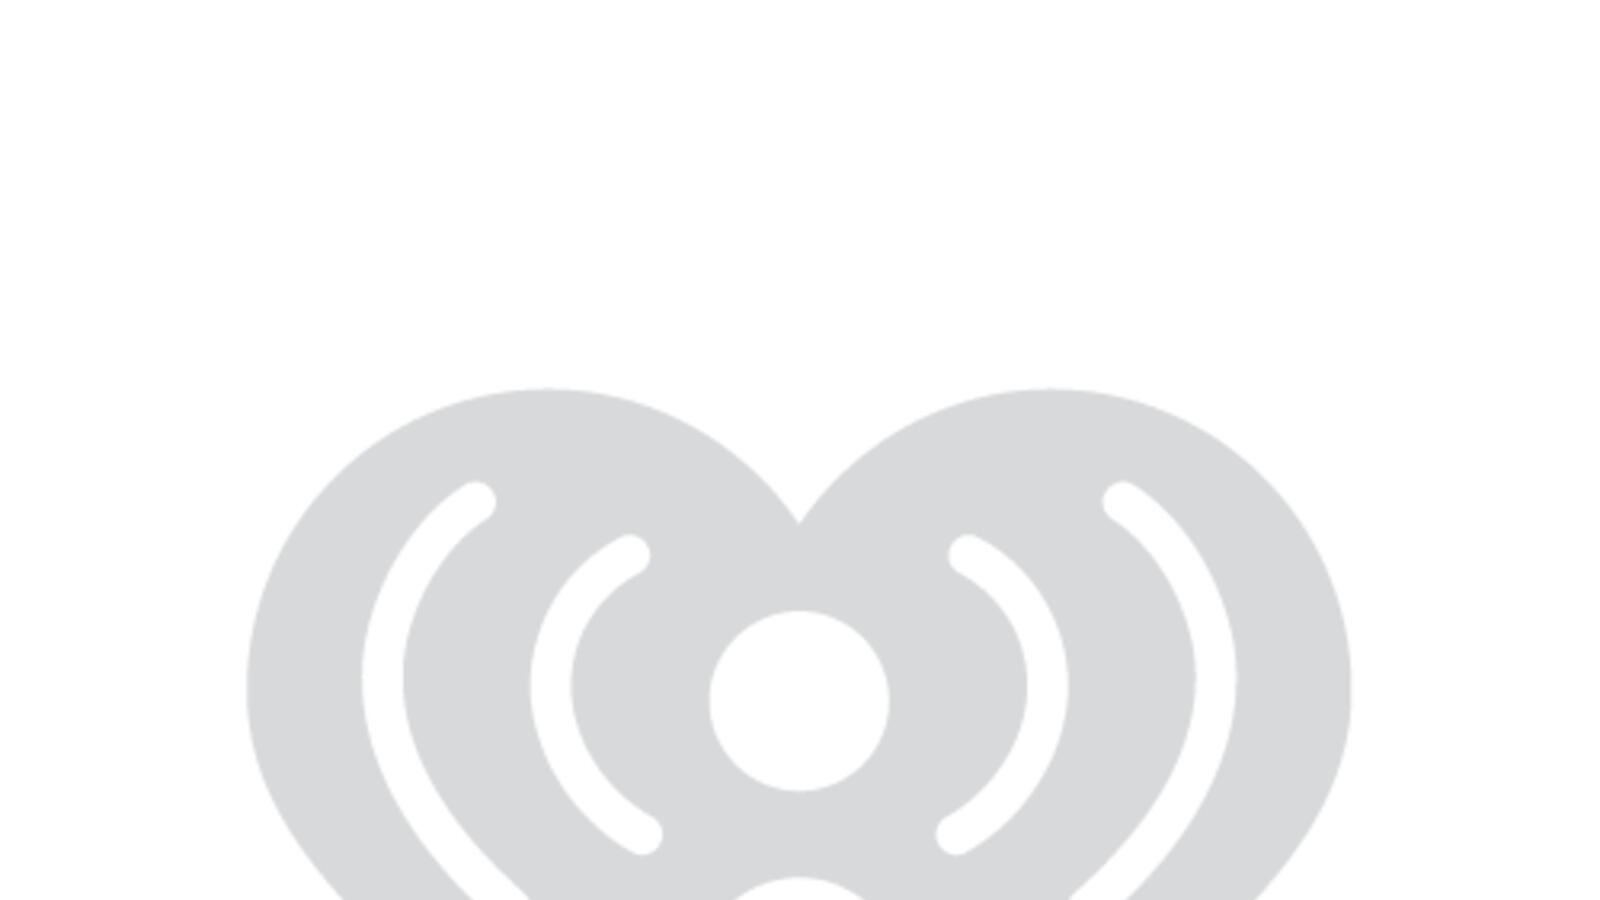 Nailers Travel to Ft. Wayne for Season Opener Tonight